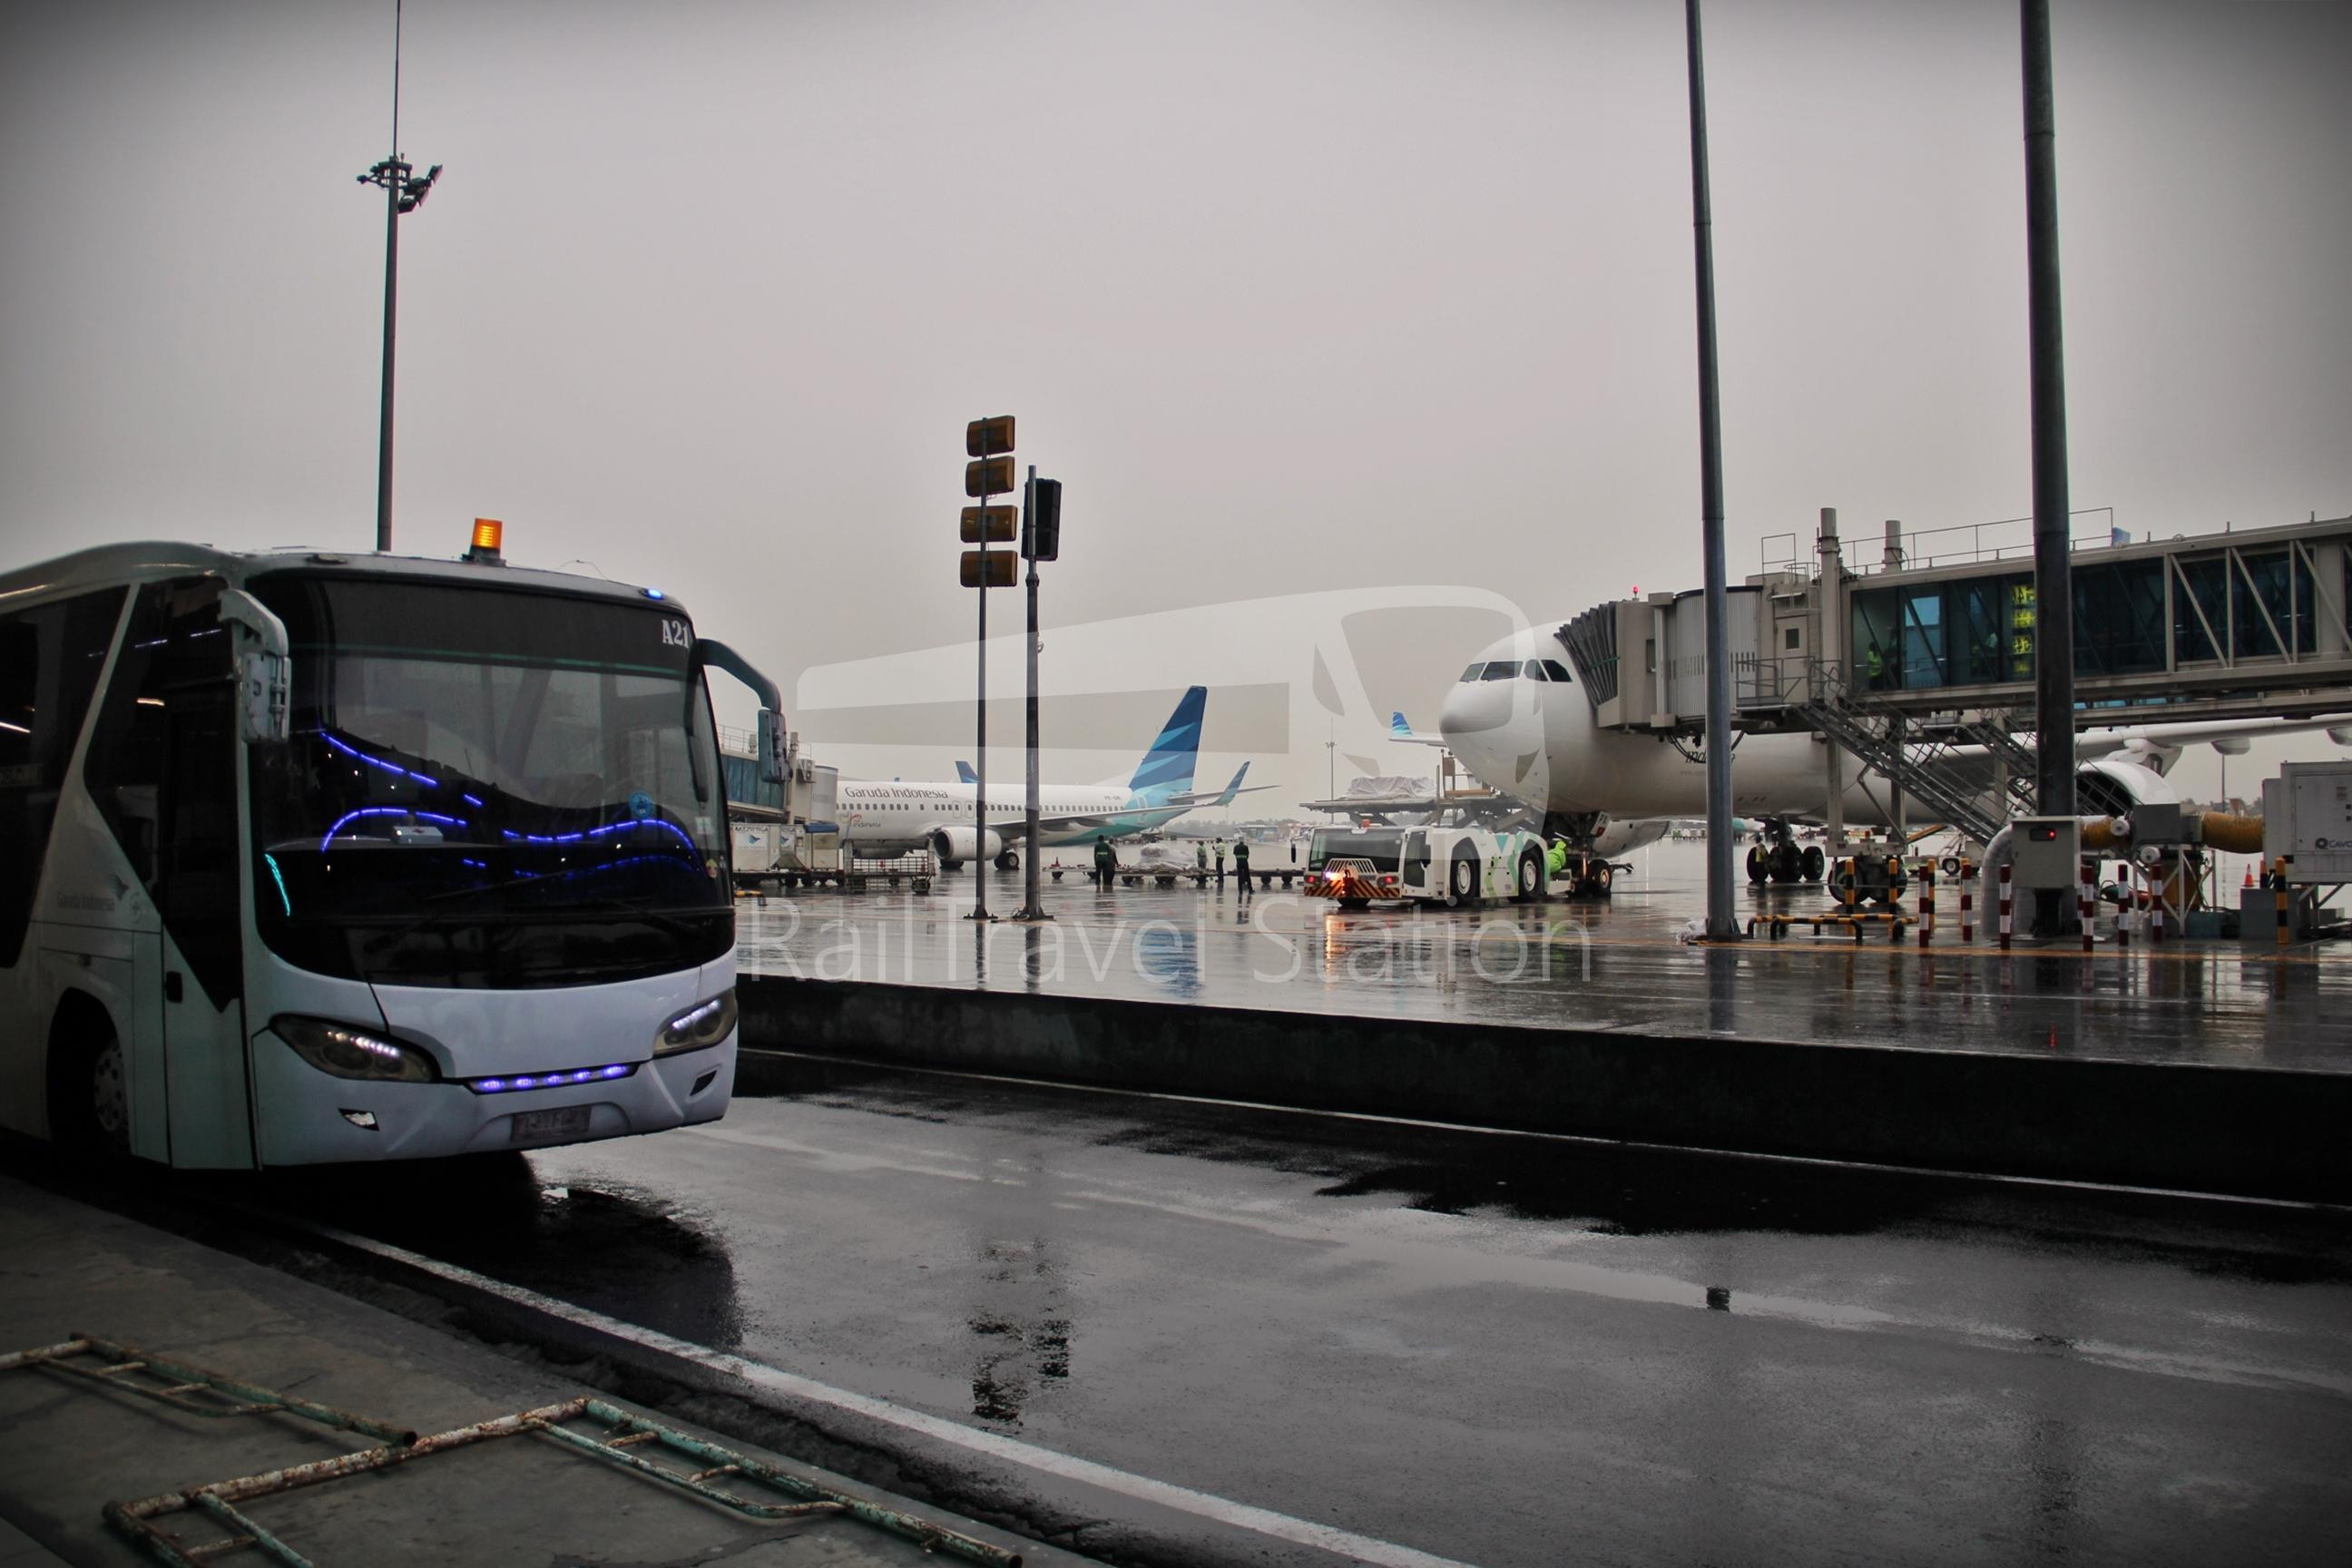 Garuda Indonesia GA838: Jakarta Soekarno-Hatta to Singapore by Airbus A330-300